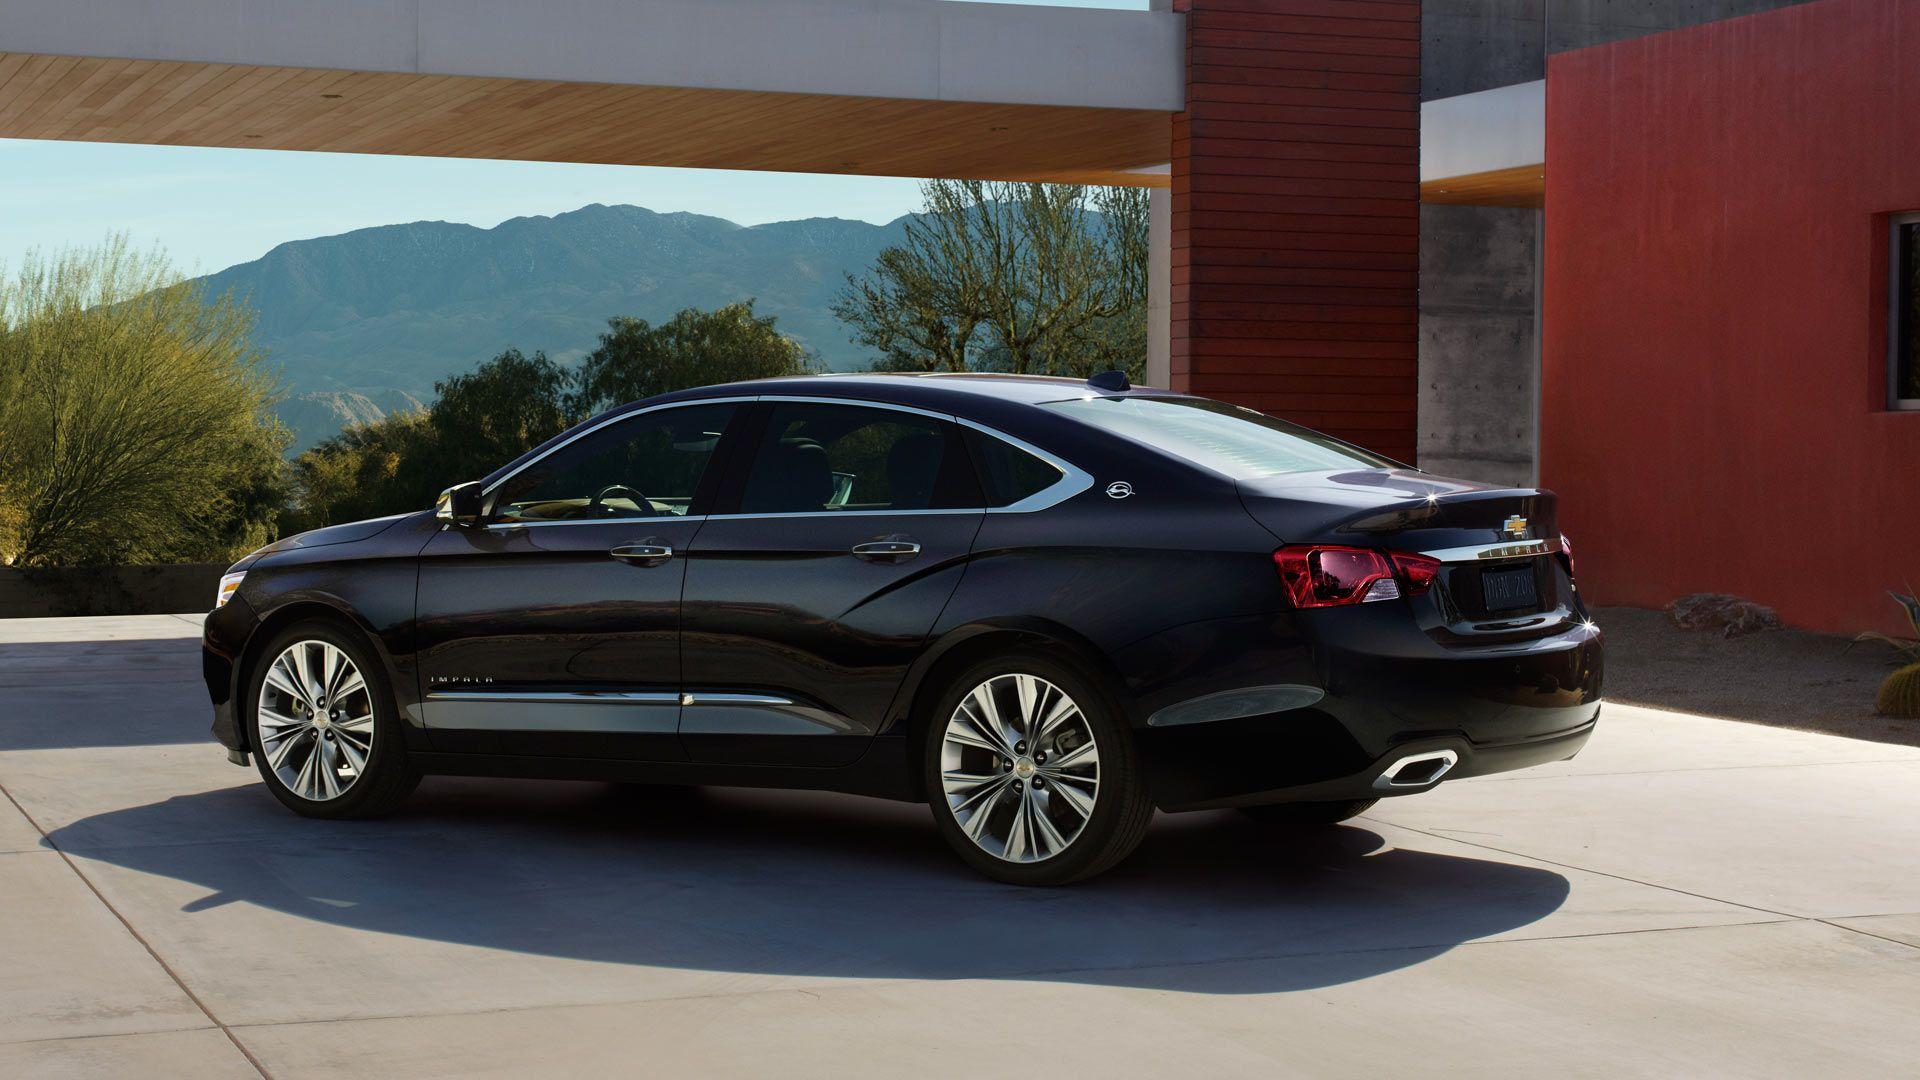 Sports Sedan 2014 Impala Ltz With Available 20 Inch Aluminum